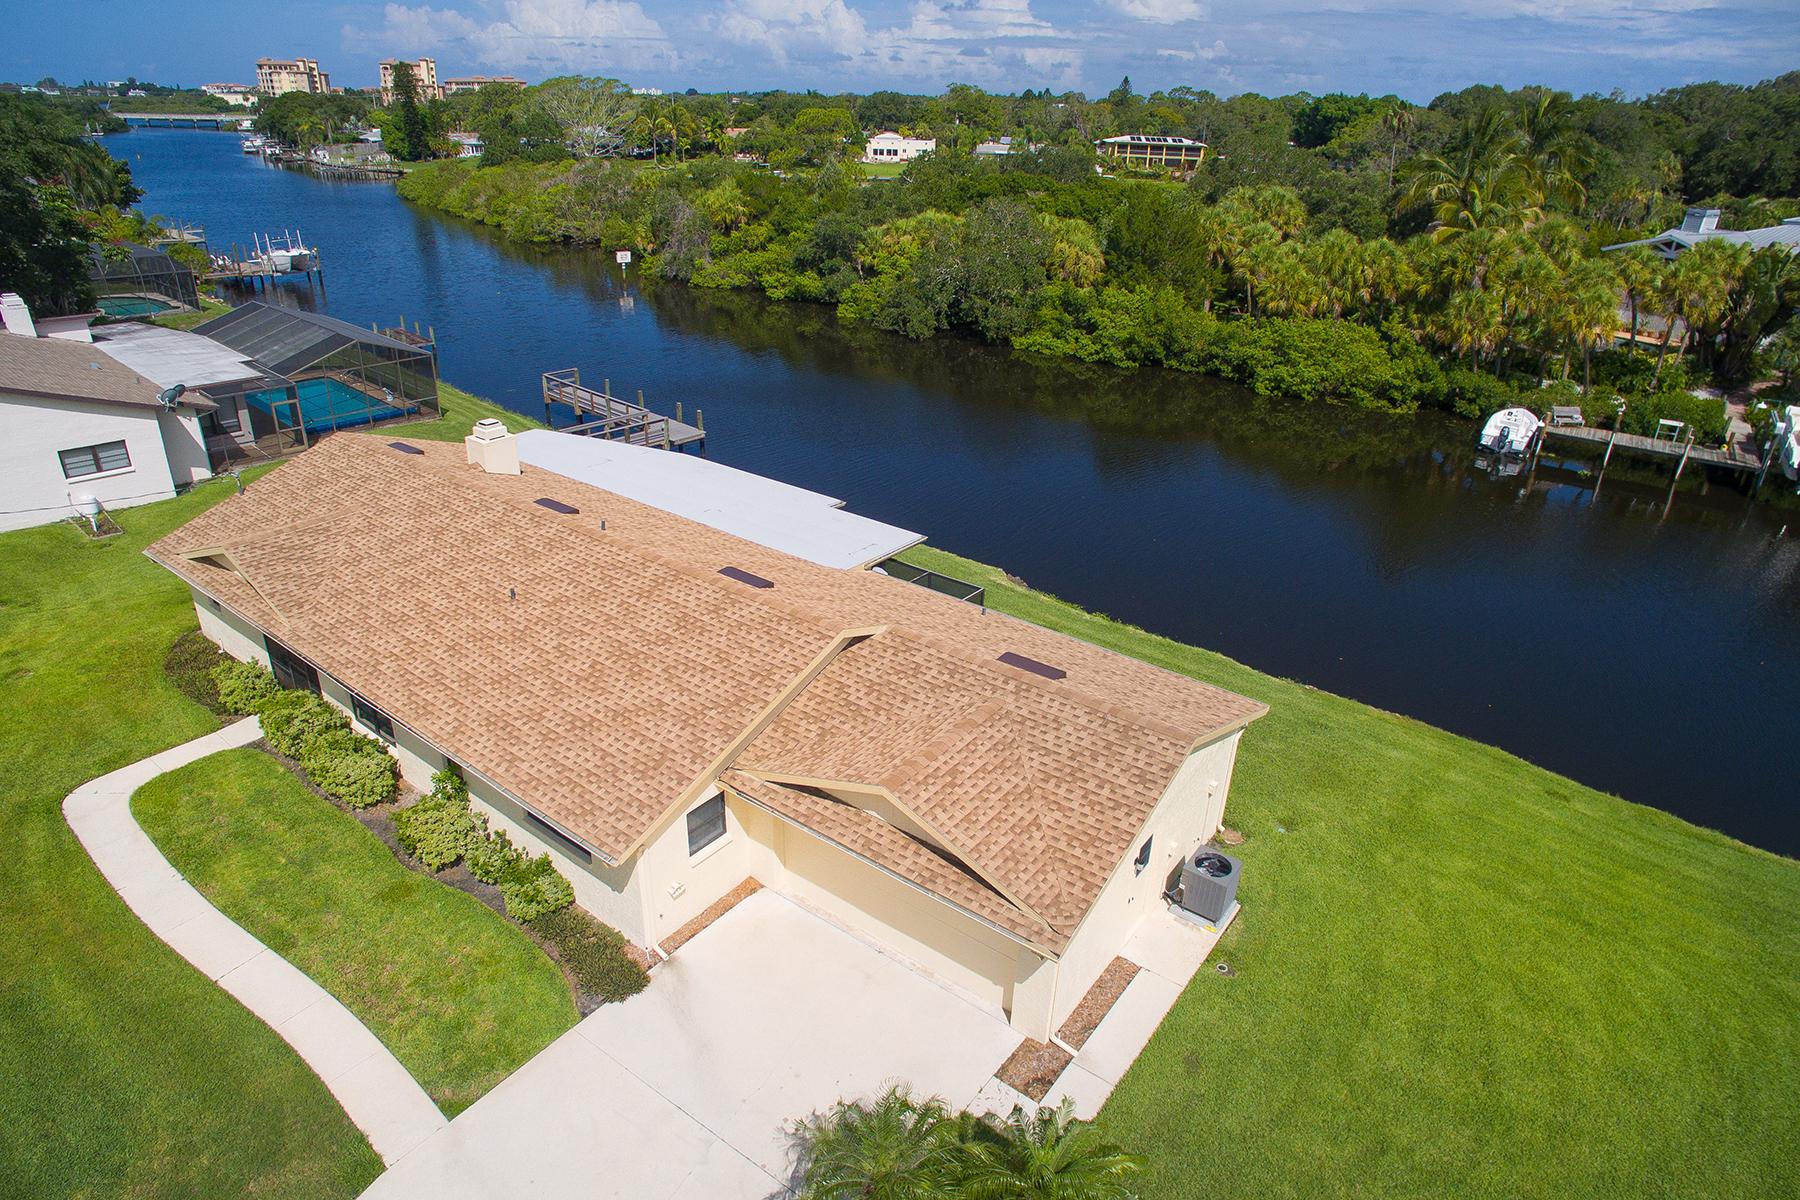 独户住宅 为 销售 在 PHILLIPPI GARDENS 5412 America Dr Sarasota, 佛罗里达州 34231 美国